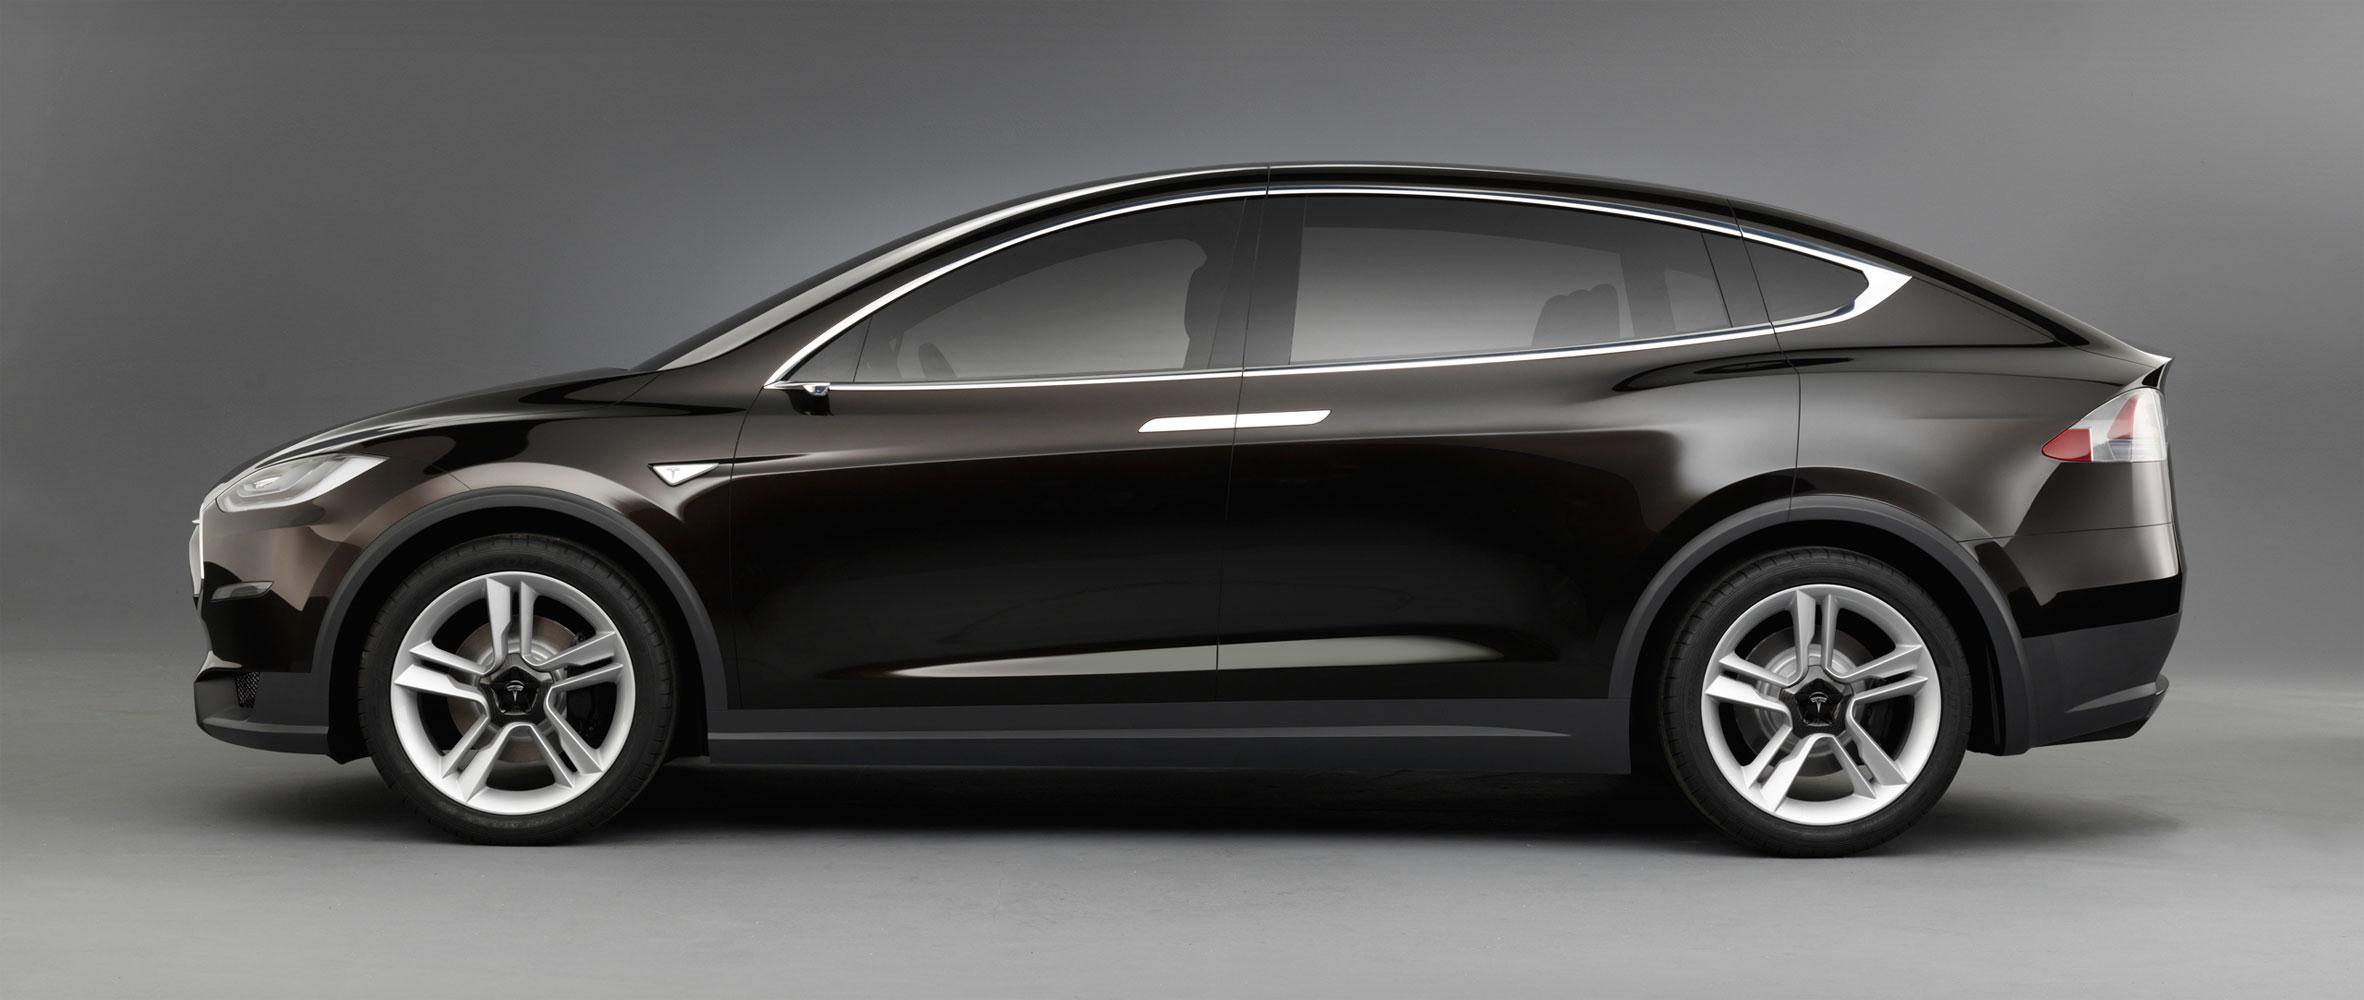 tesla zuwachs model x mittelklasse roadster pickup elektroauto blog. Black Bedroom Furniture Sets. Home Design Ideas